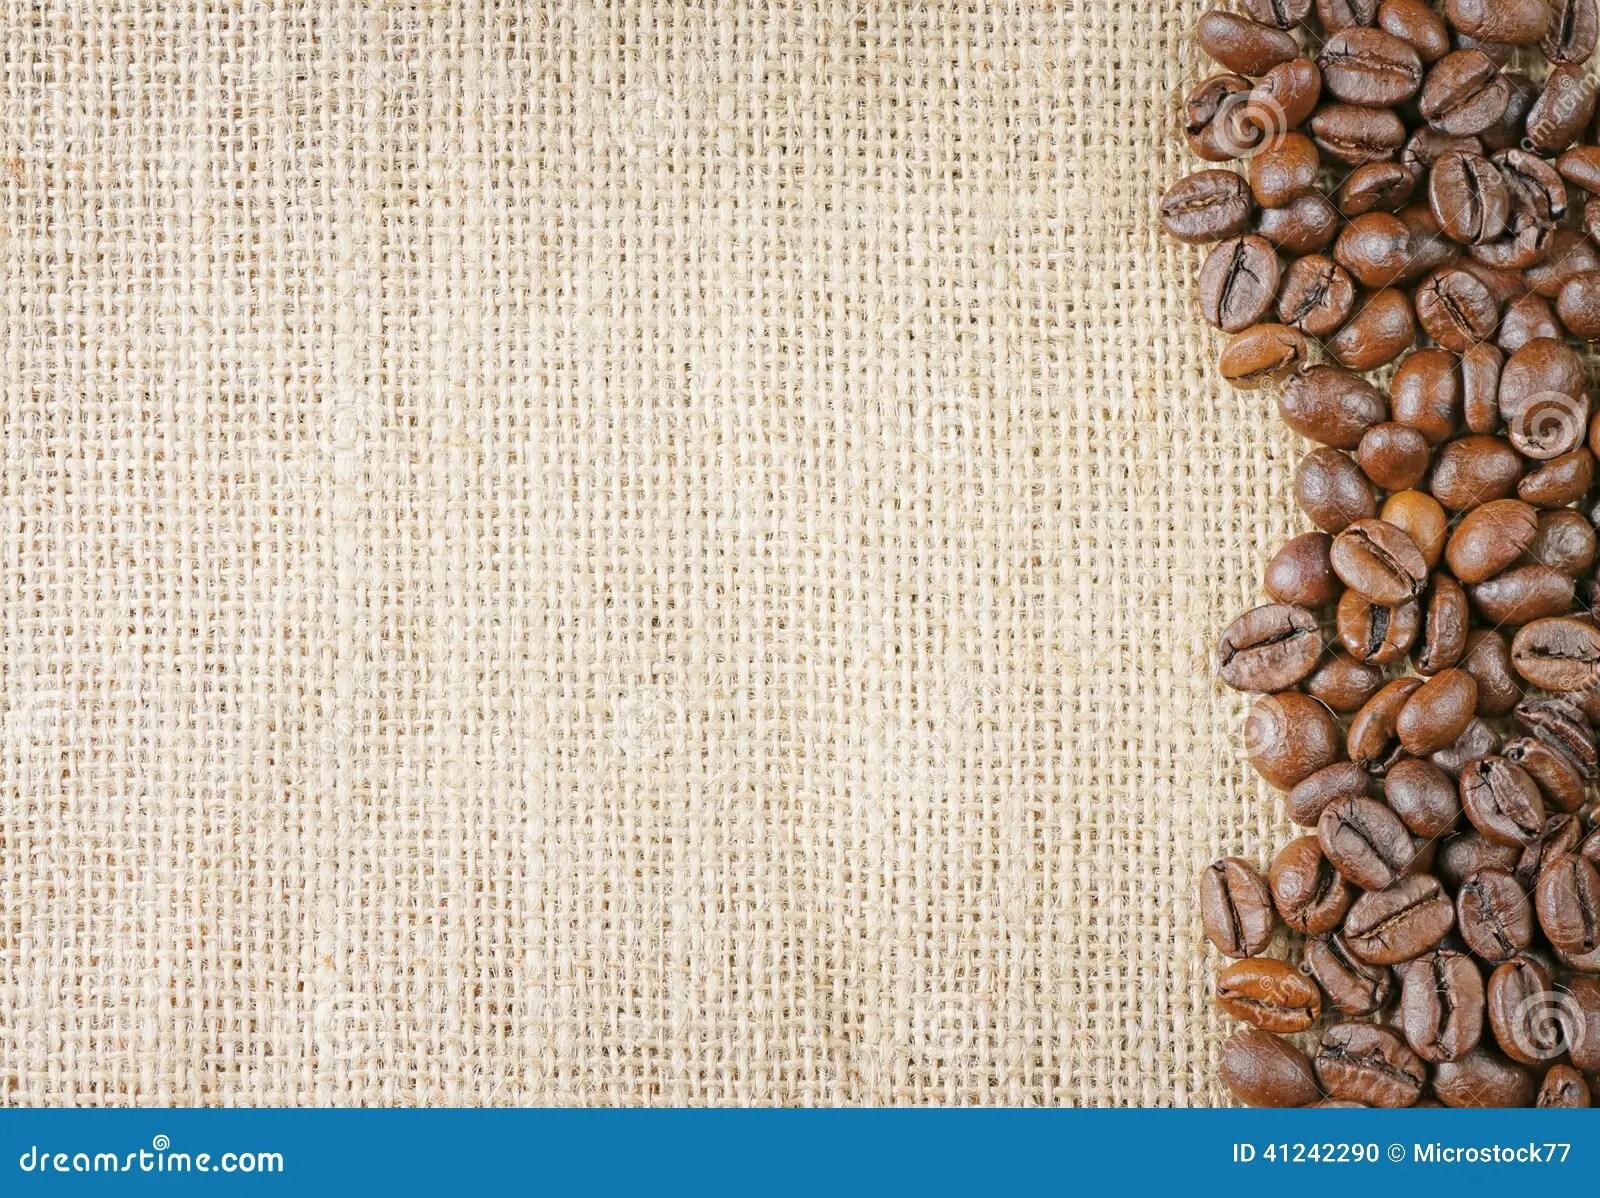 Coffee beans juta stock photo Image of aromatic field